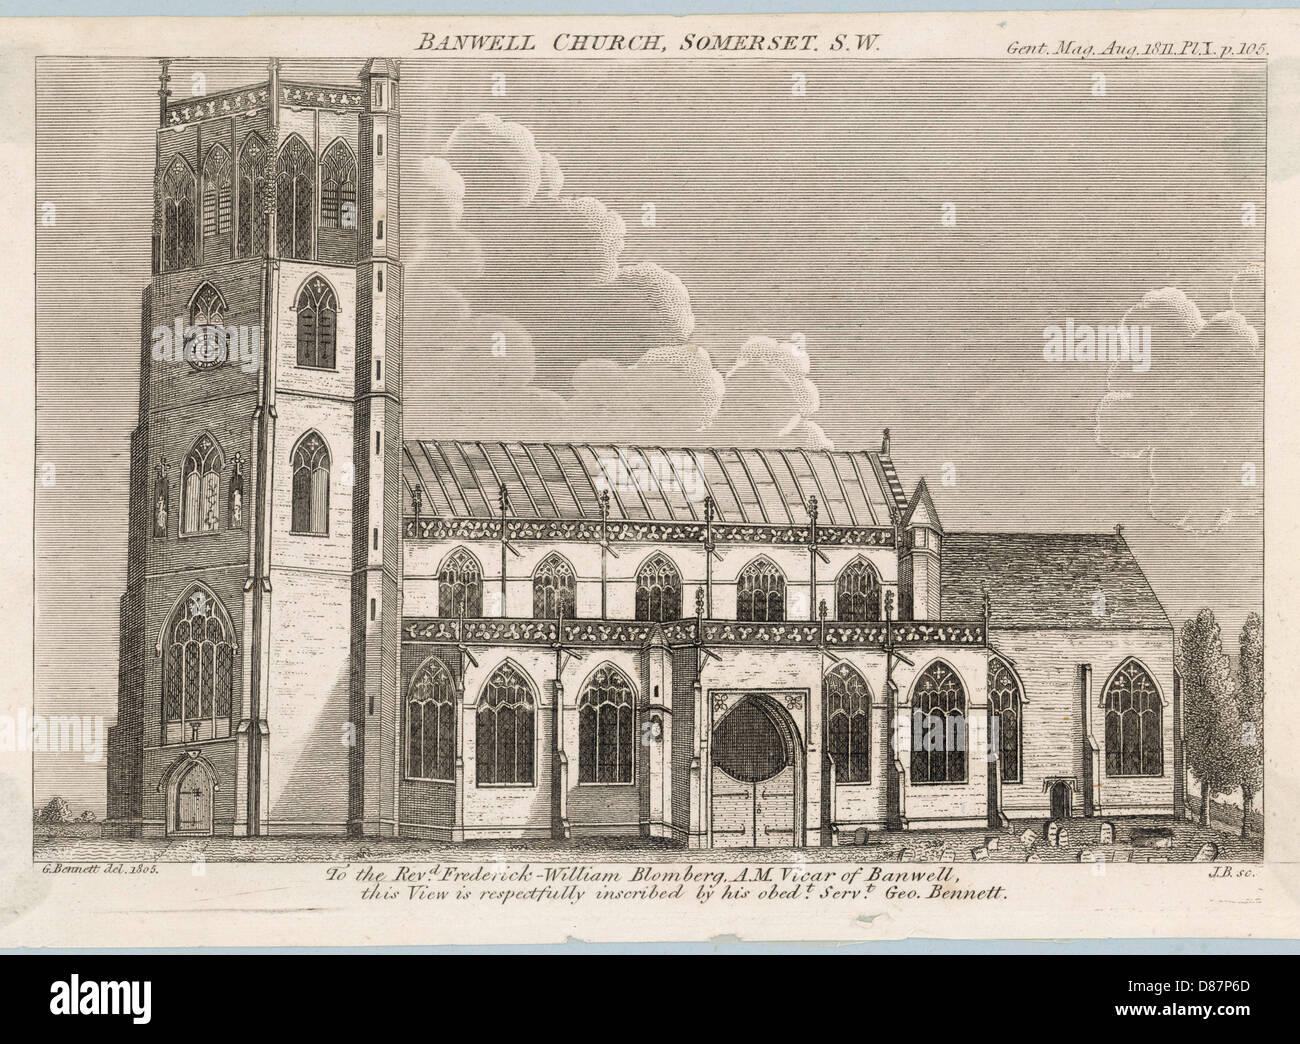 Churches Banwell 1811 - Stock Image